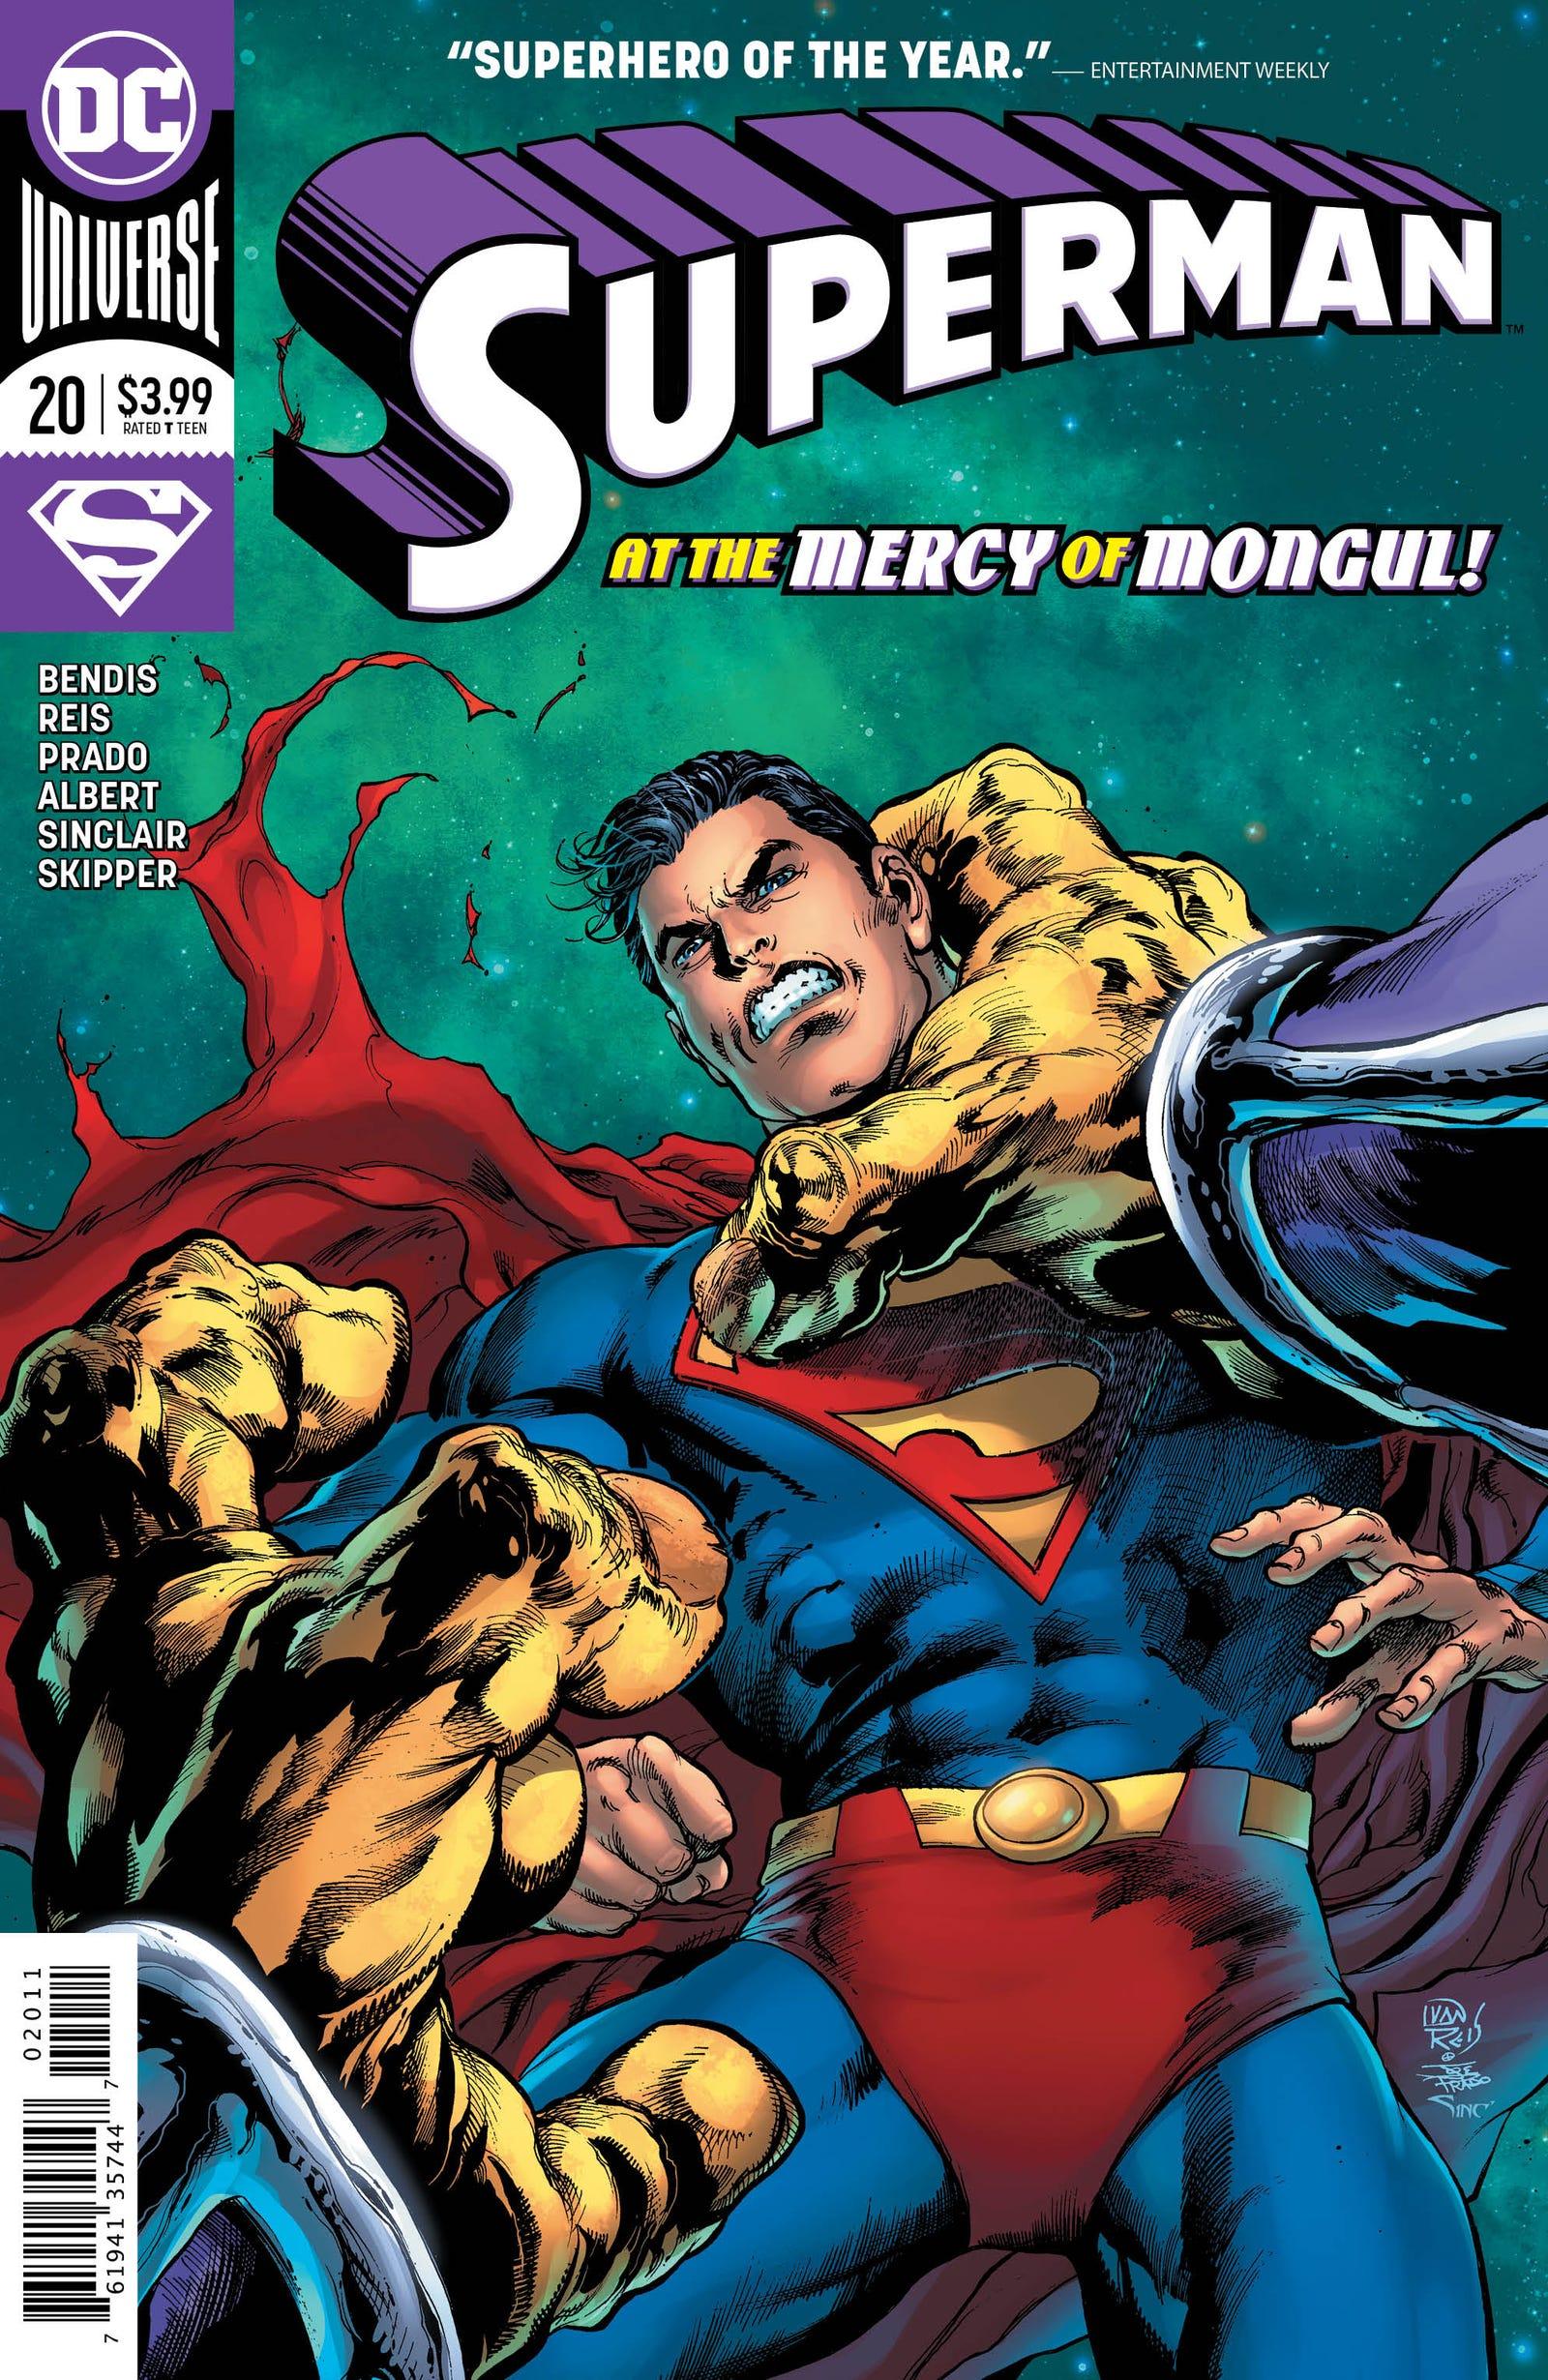 Cover by Ivan Reis, Joe Prado, and Alex Sinclair